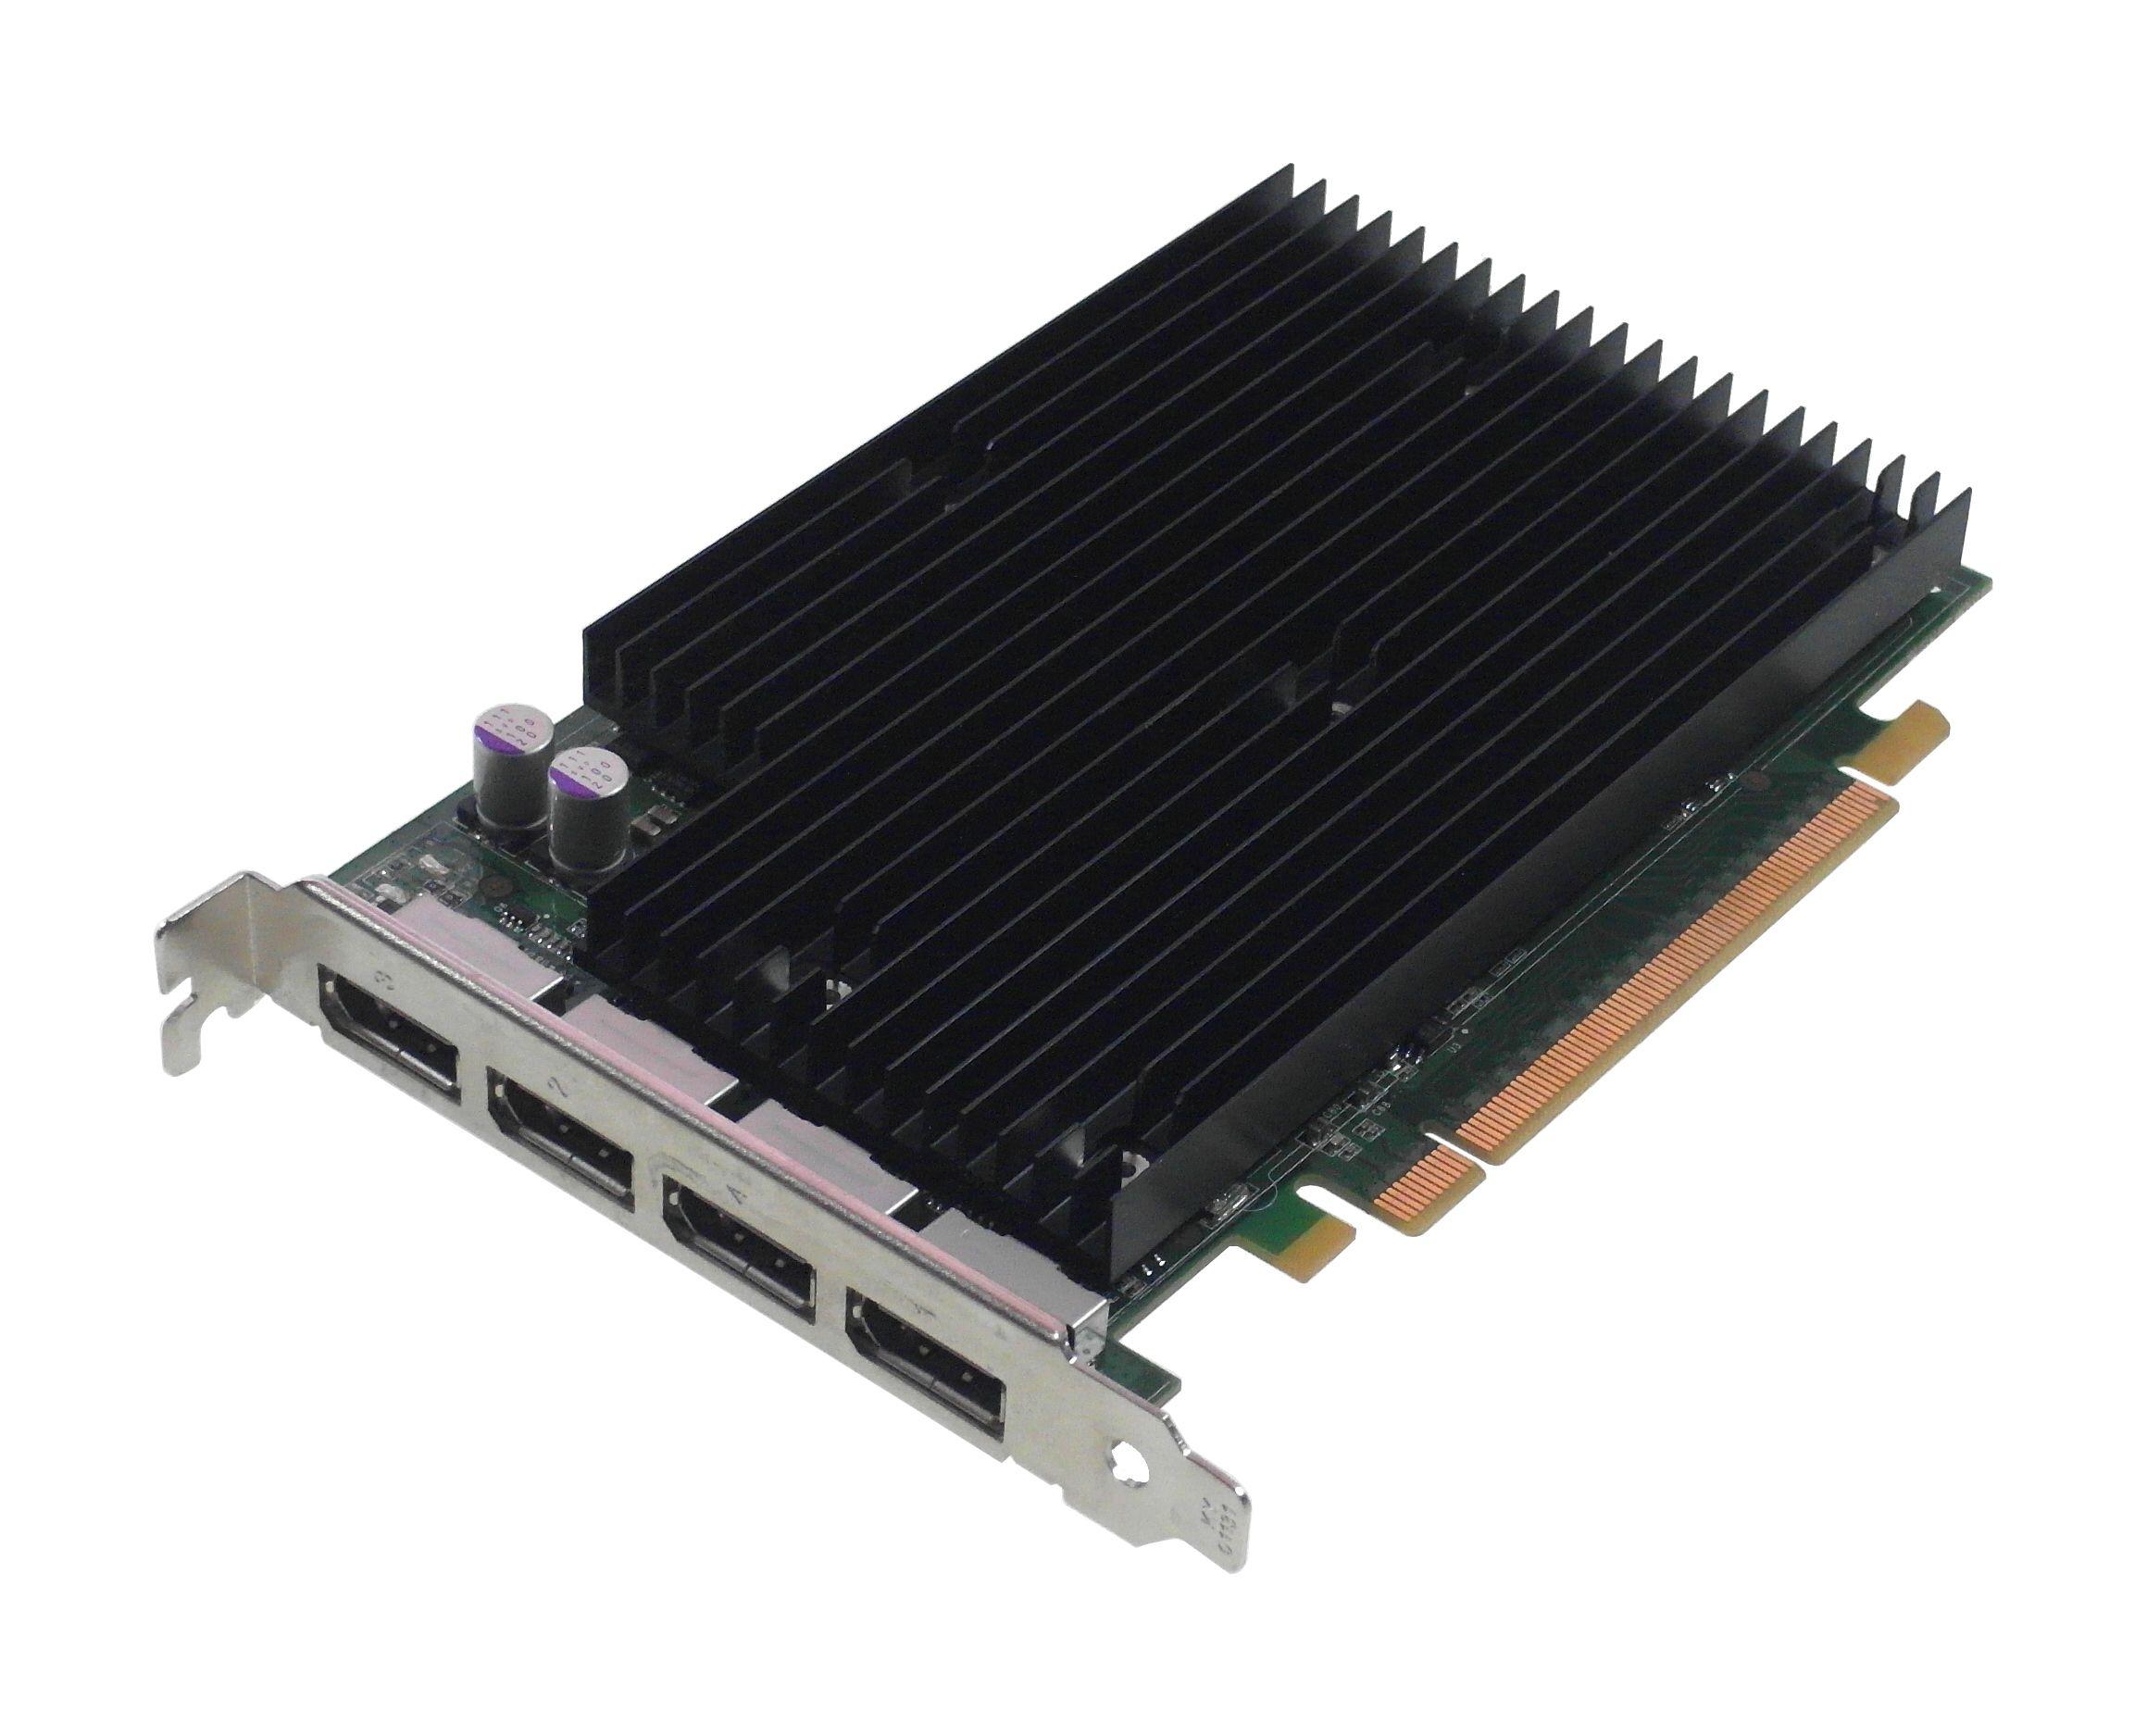 Karta Graficzna Nvidia Quadro Nvs 450 512mb 7400221298 Oficjalne